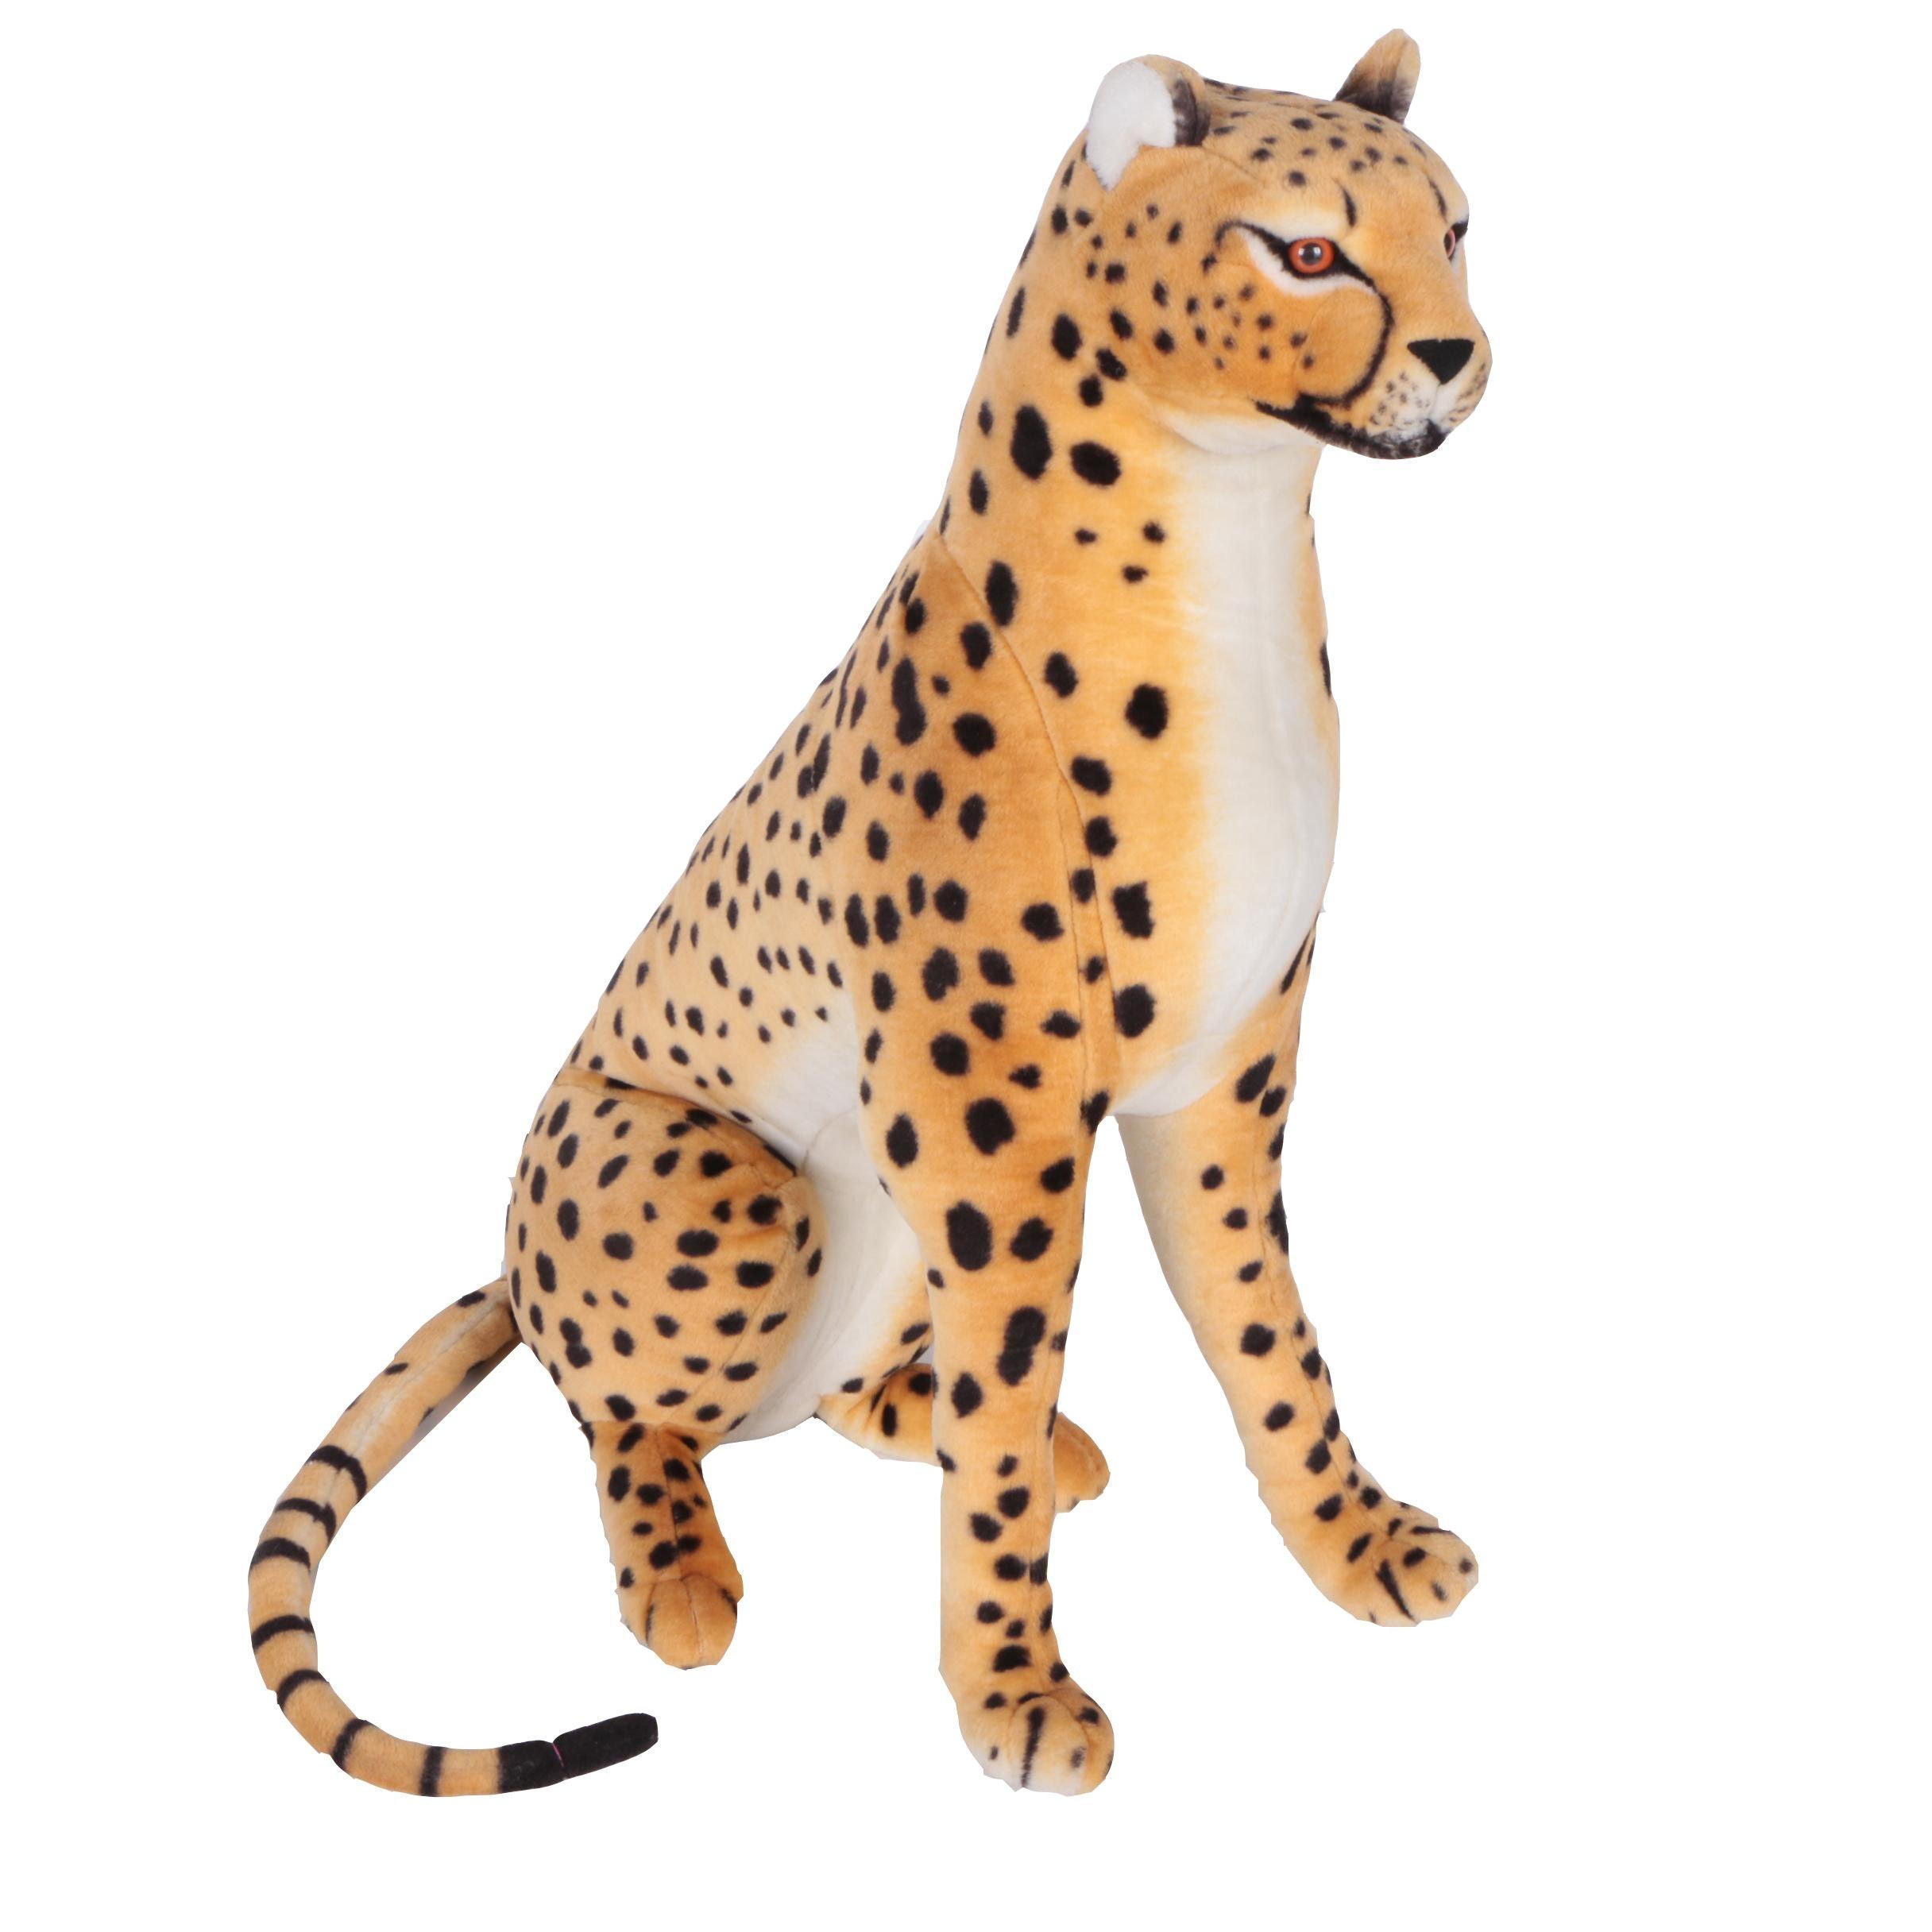 Cheetah Stuffed Animal Toy